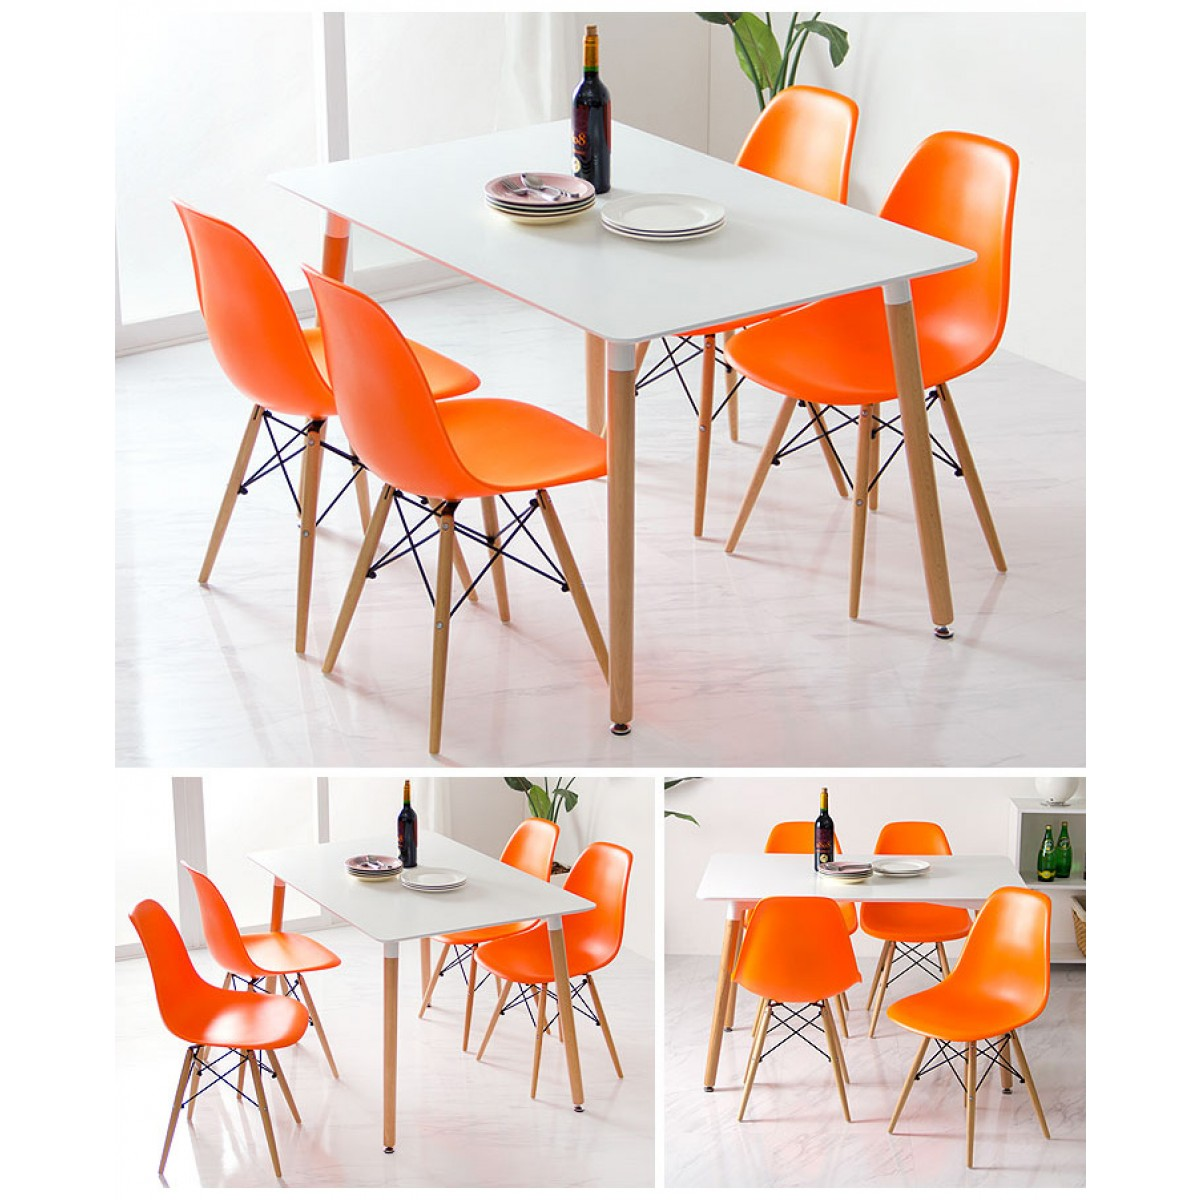 Dsw Molded Orange Plastic Dining Shell Chair With Dark Walnut Wood Eiffel Legs